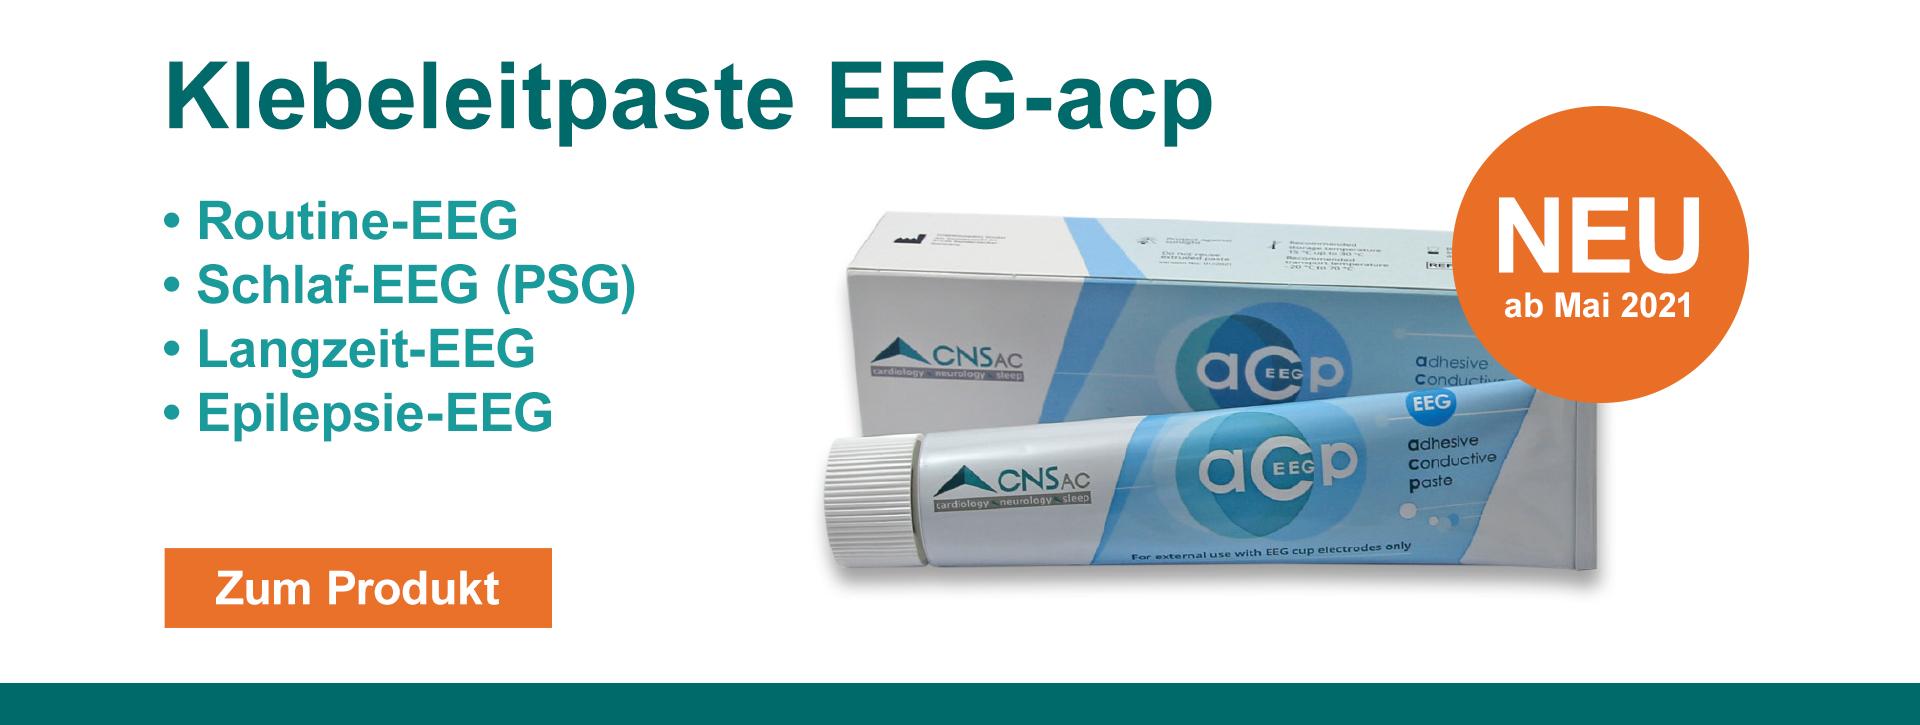 EEG-acp-Klebeleitpaste